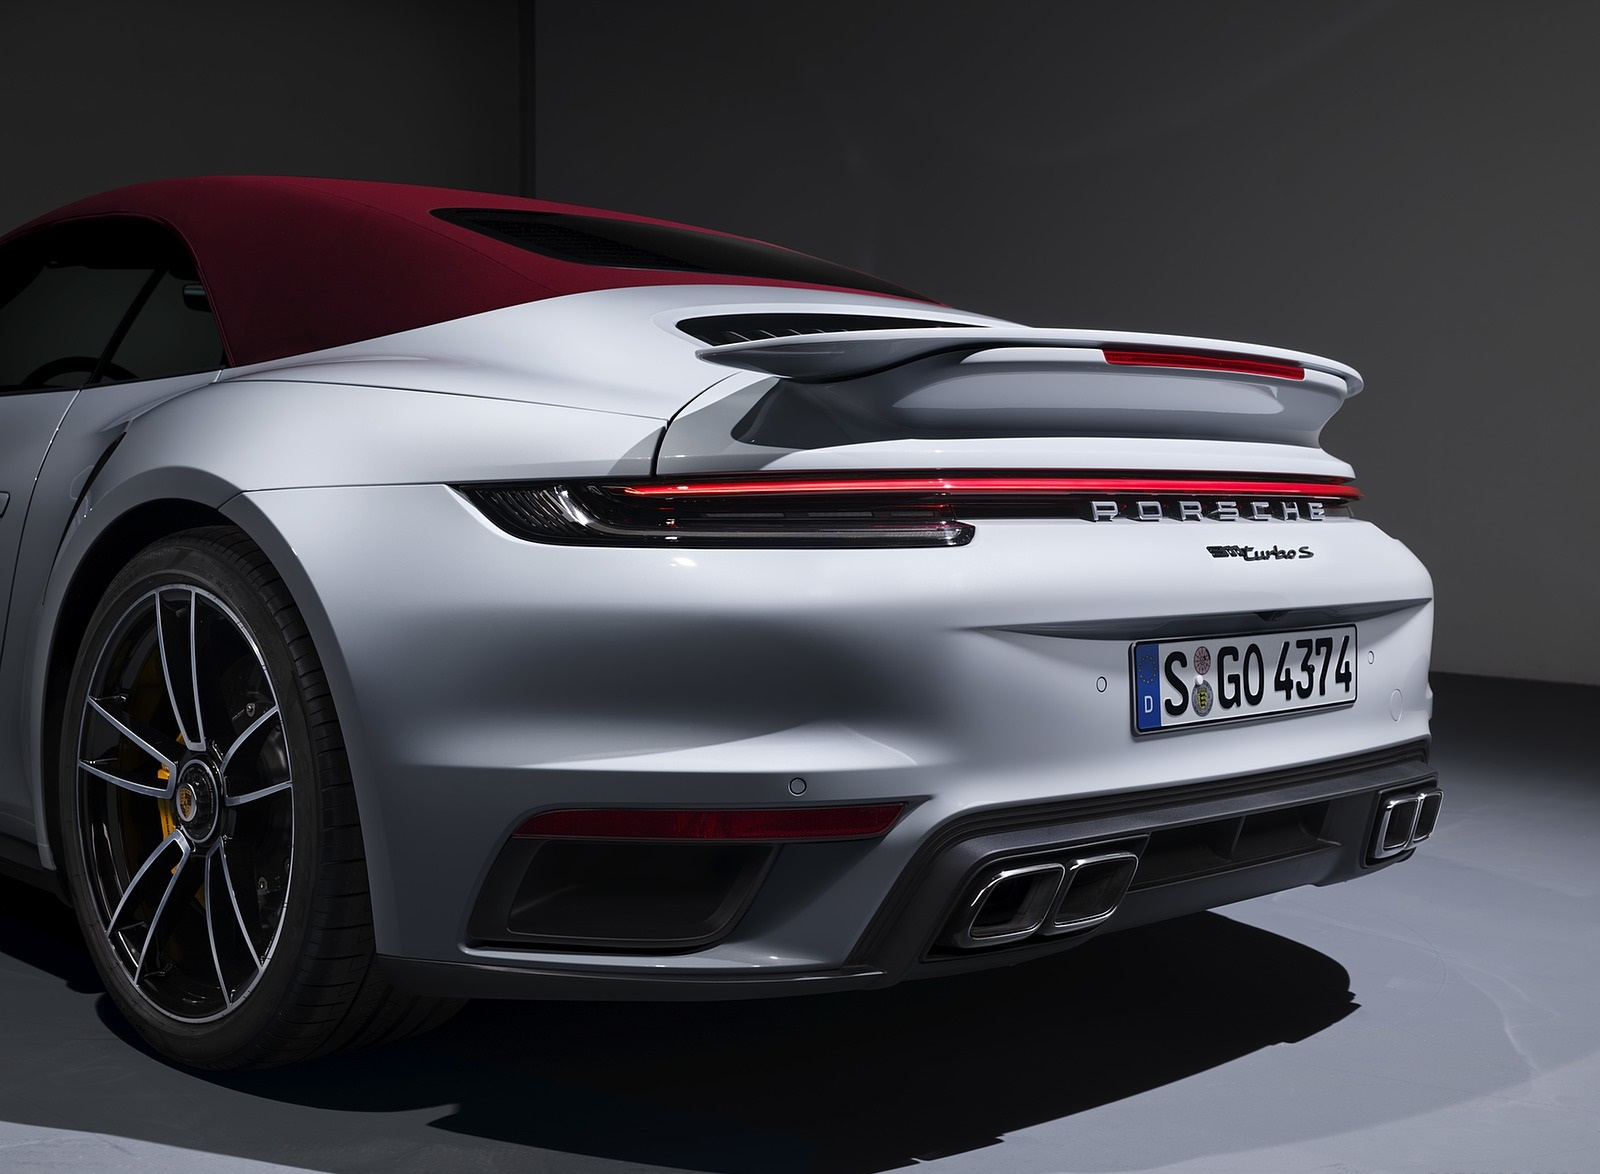 2021 Porsche 911 Turbo S Cabriolet Detail Wallpapers (6)